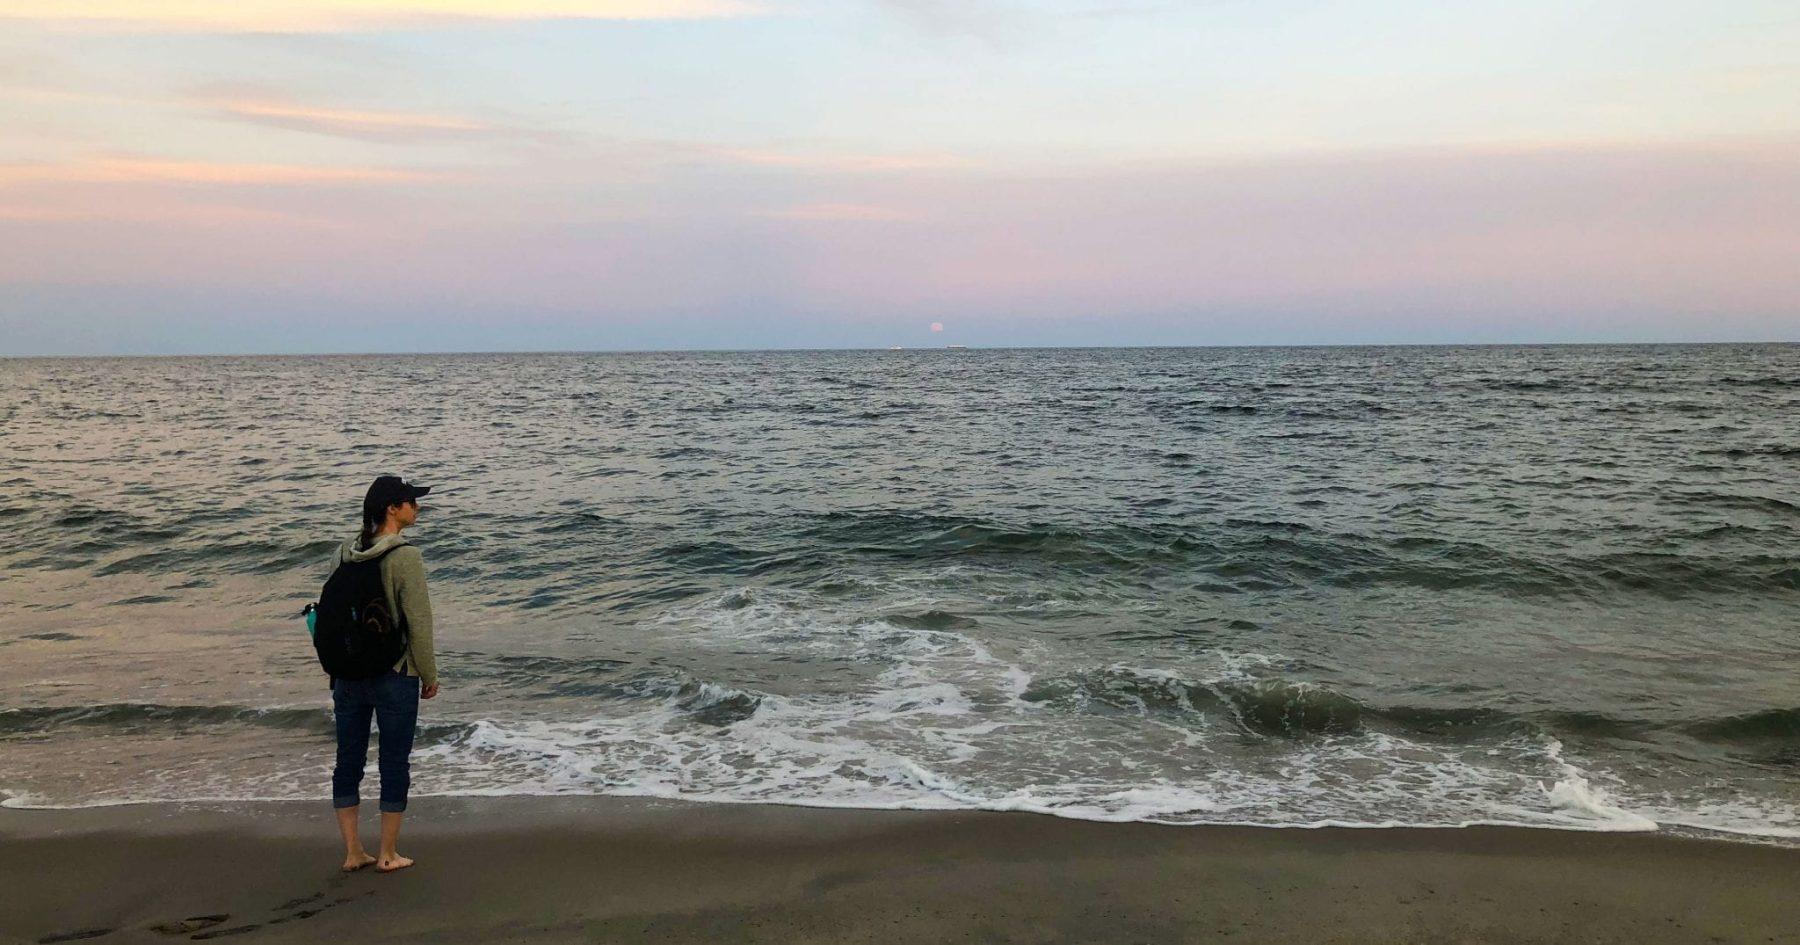 Meetup/Cleanup: Asbury Park Boardwalk